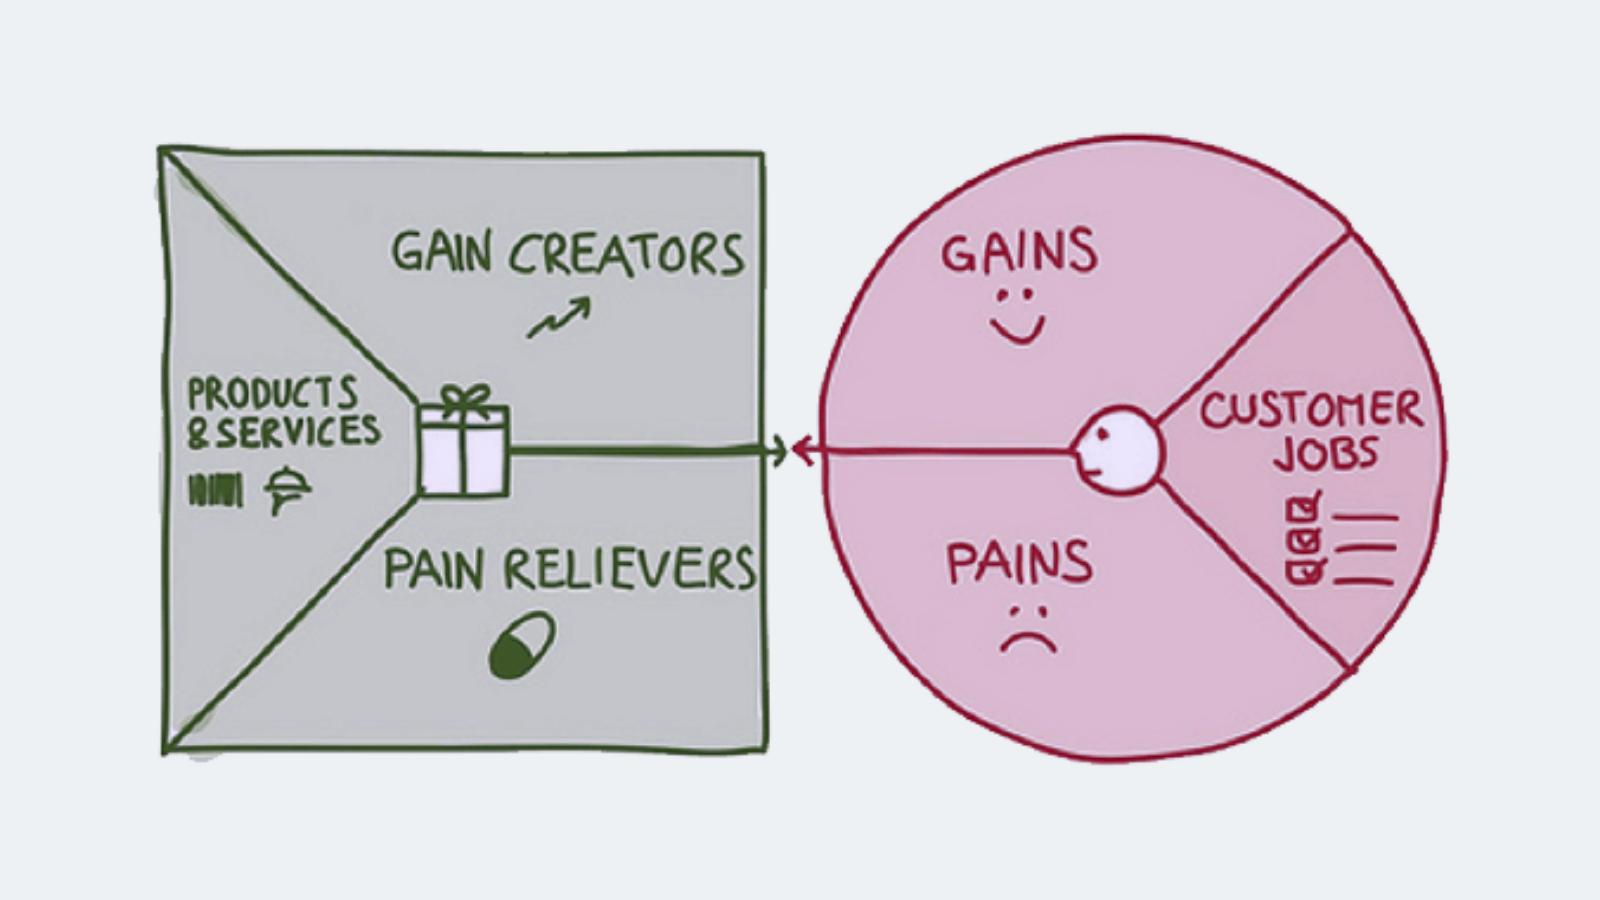 customer pains and customer gains